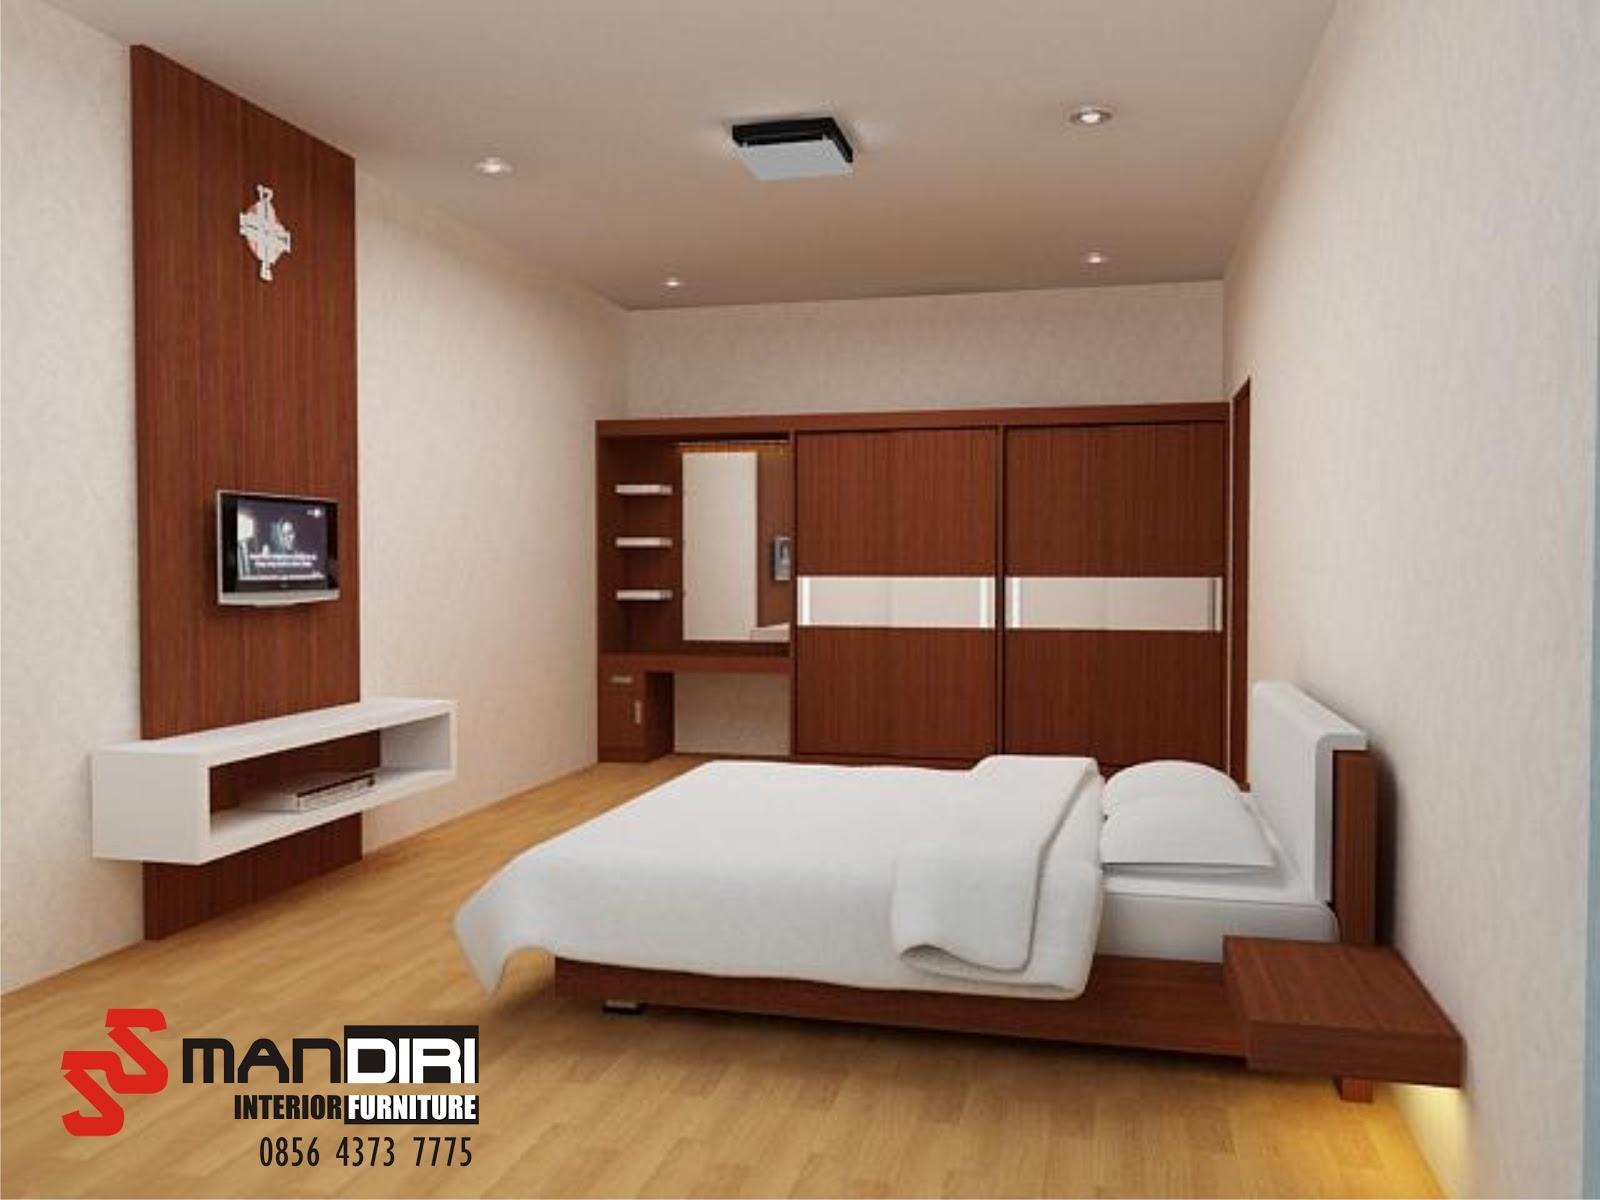 Desain Interior Apartemen 2 Kamar Tidur